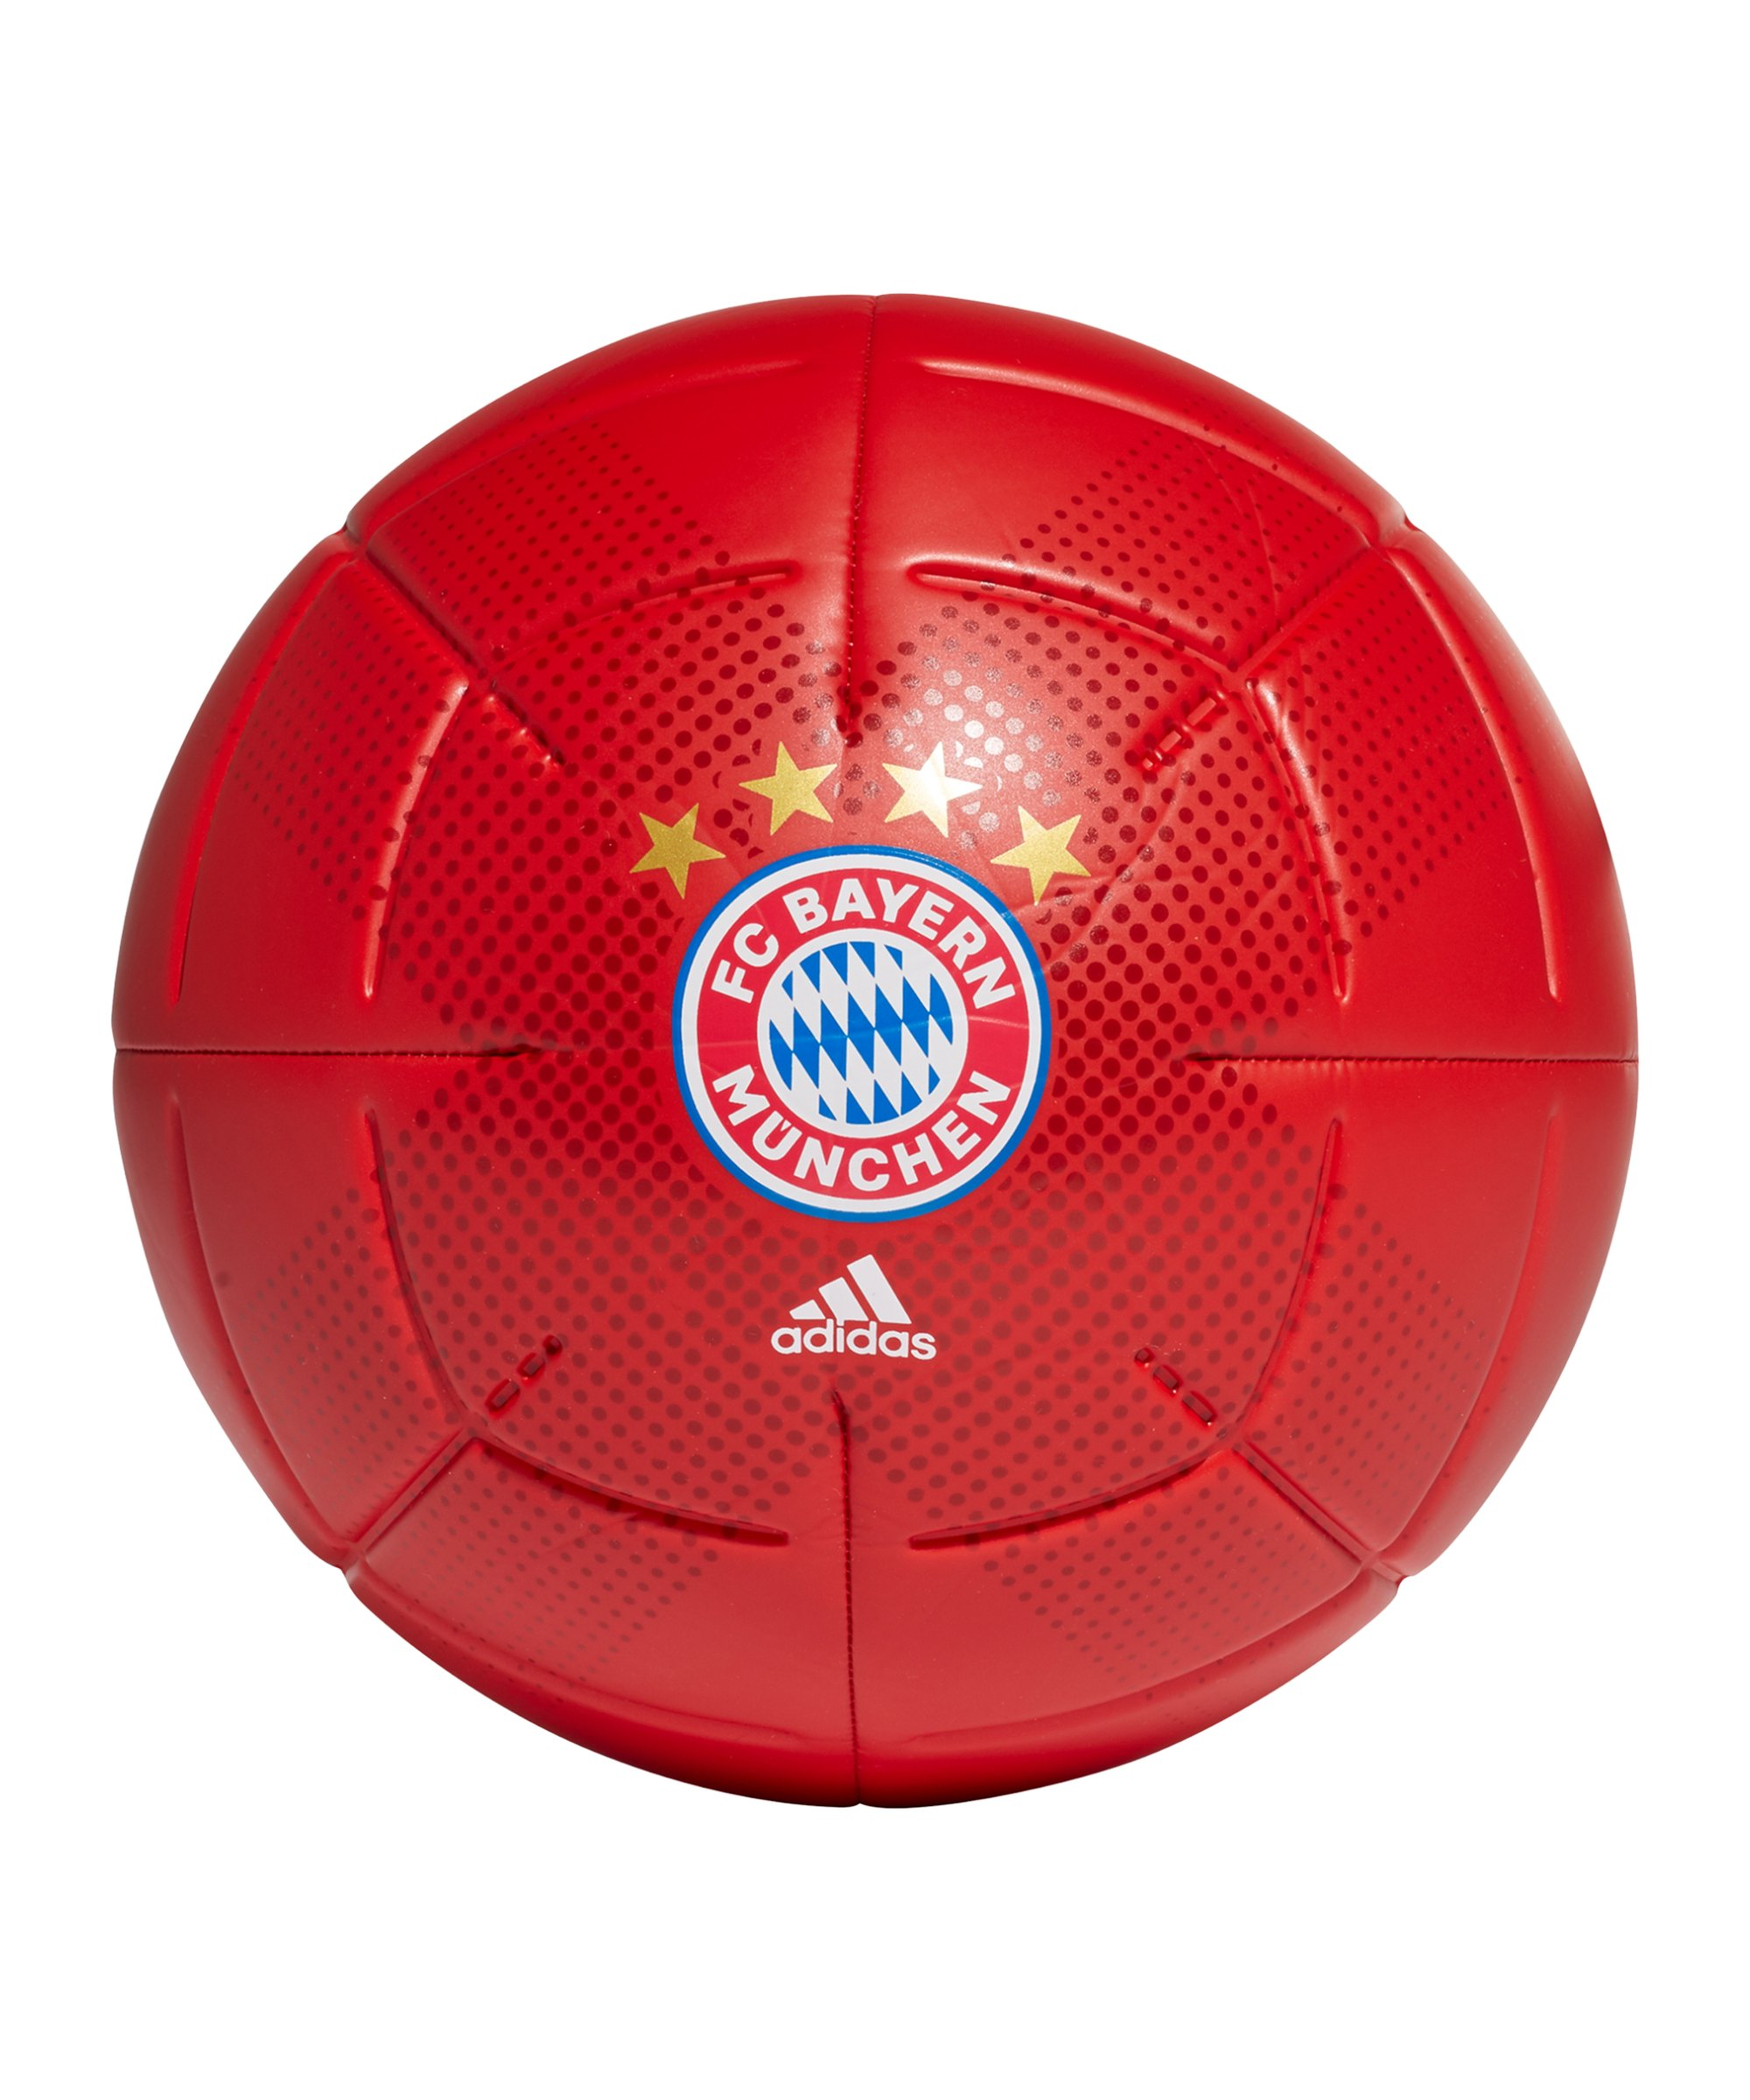 adidas FC Bayern München Club Fussball Rot Weiss - rot